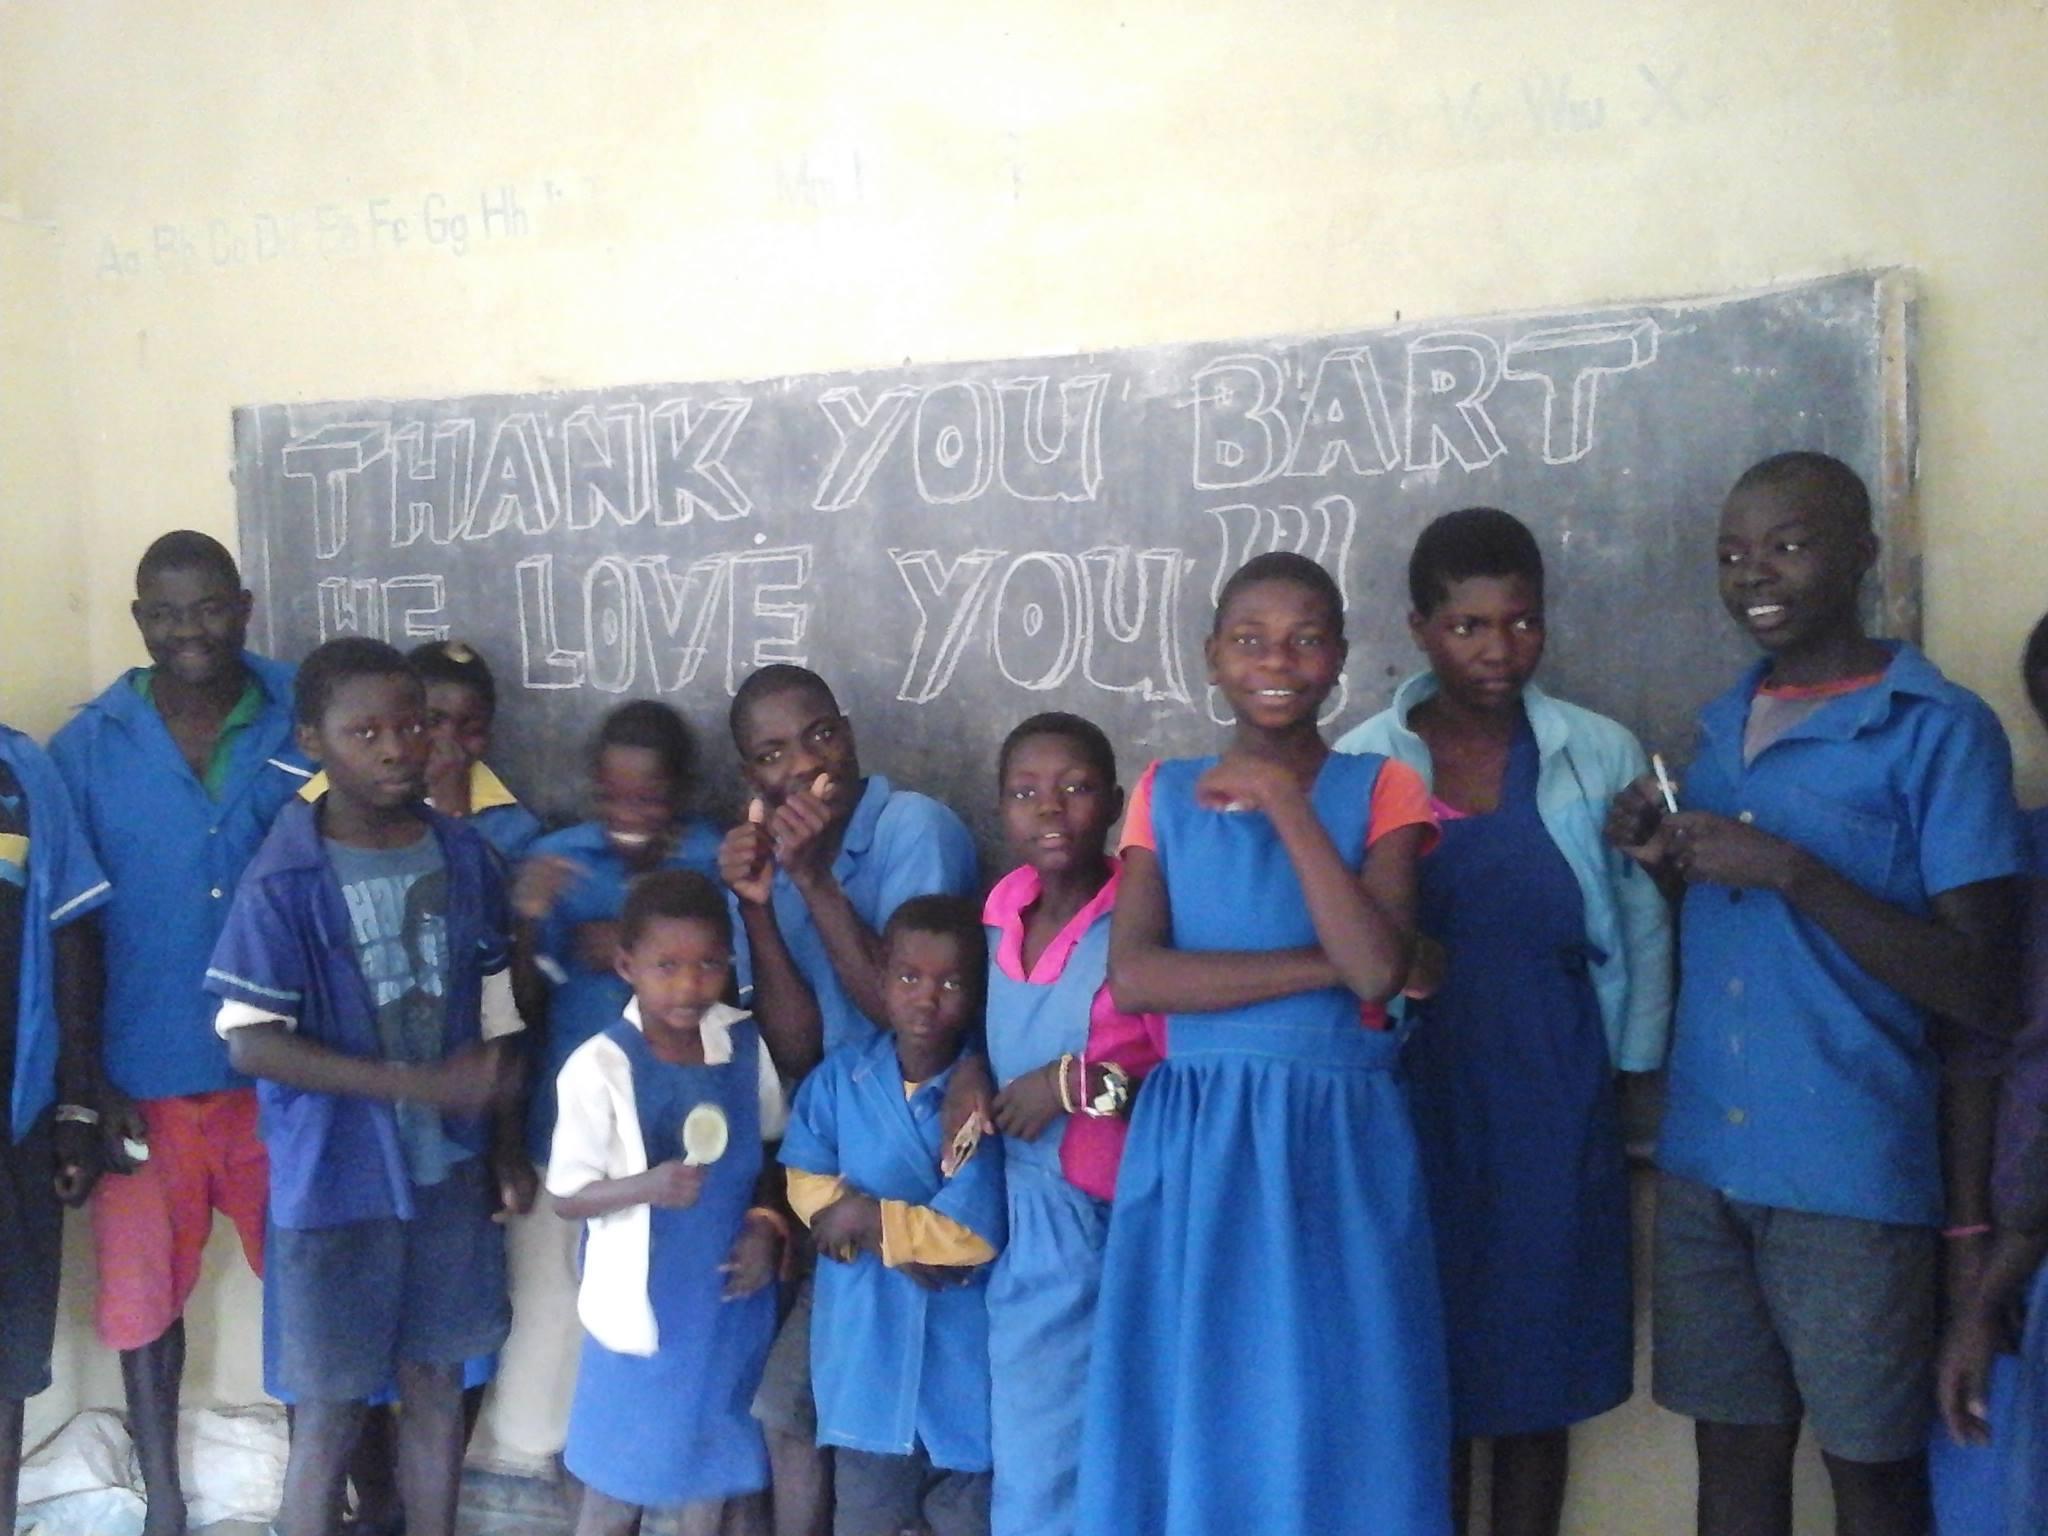 The students at Bandawe are thankful to Bart